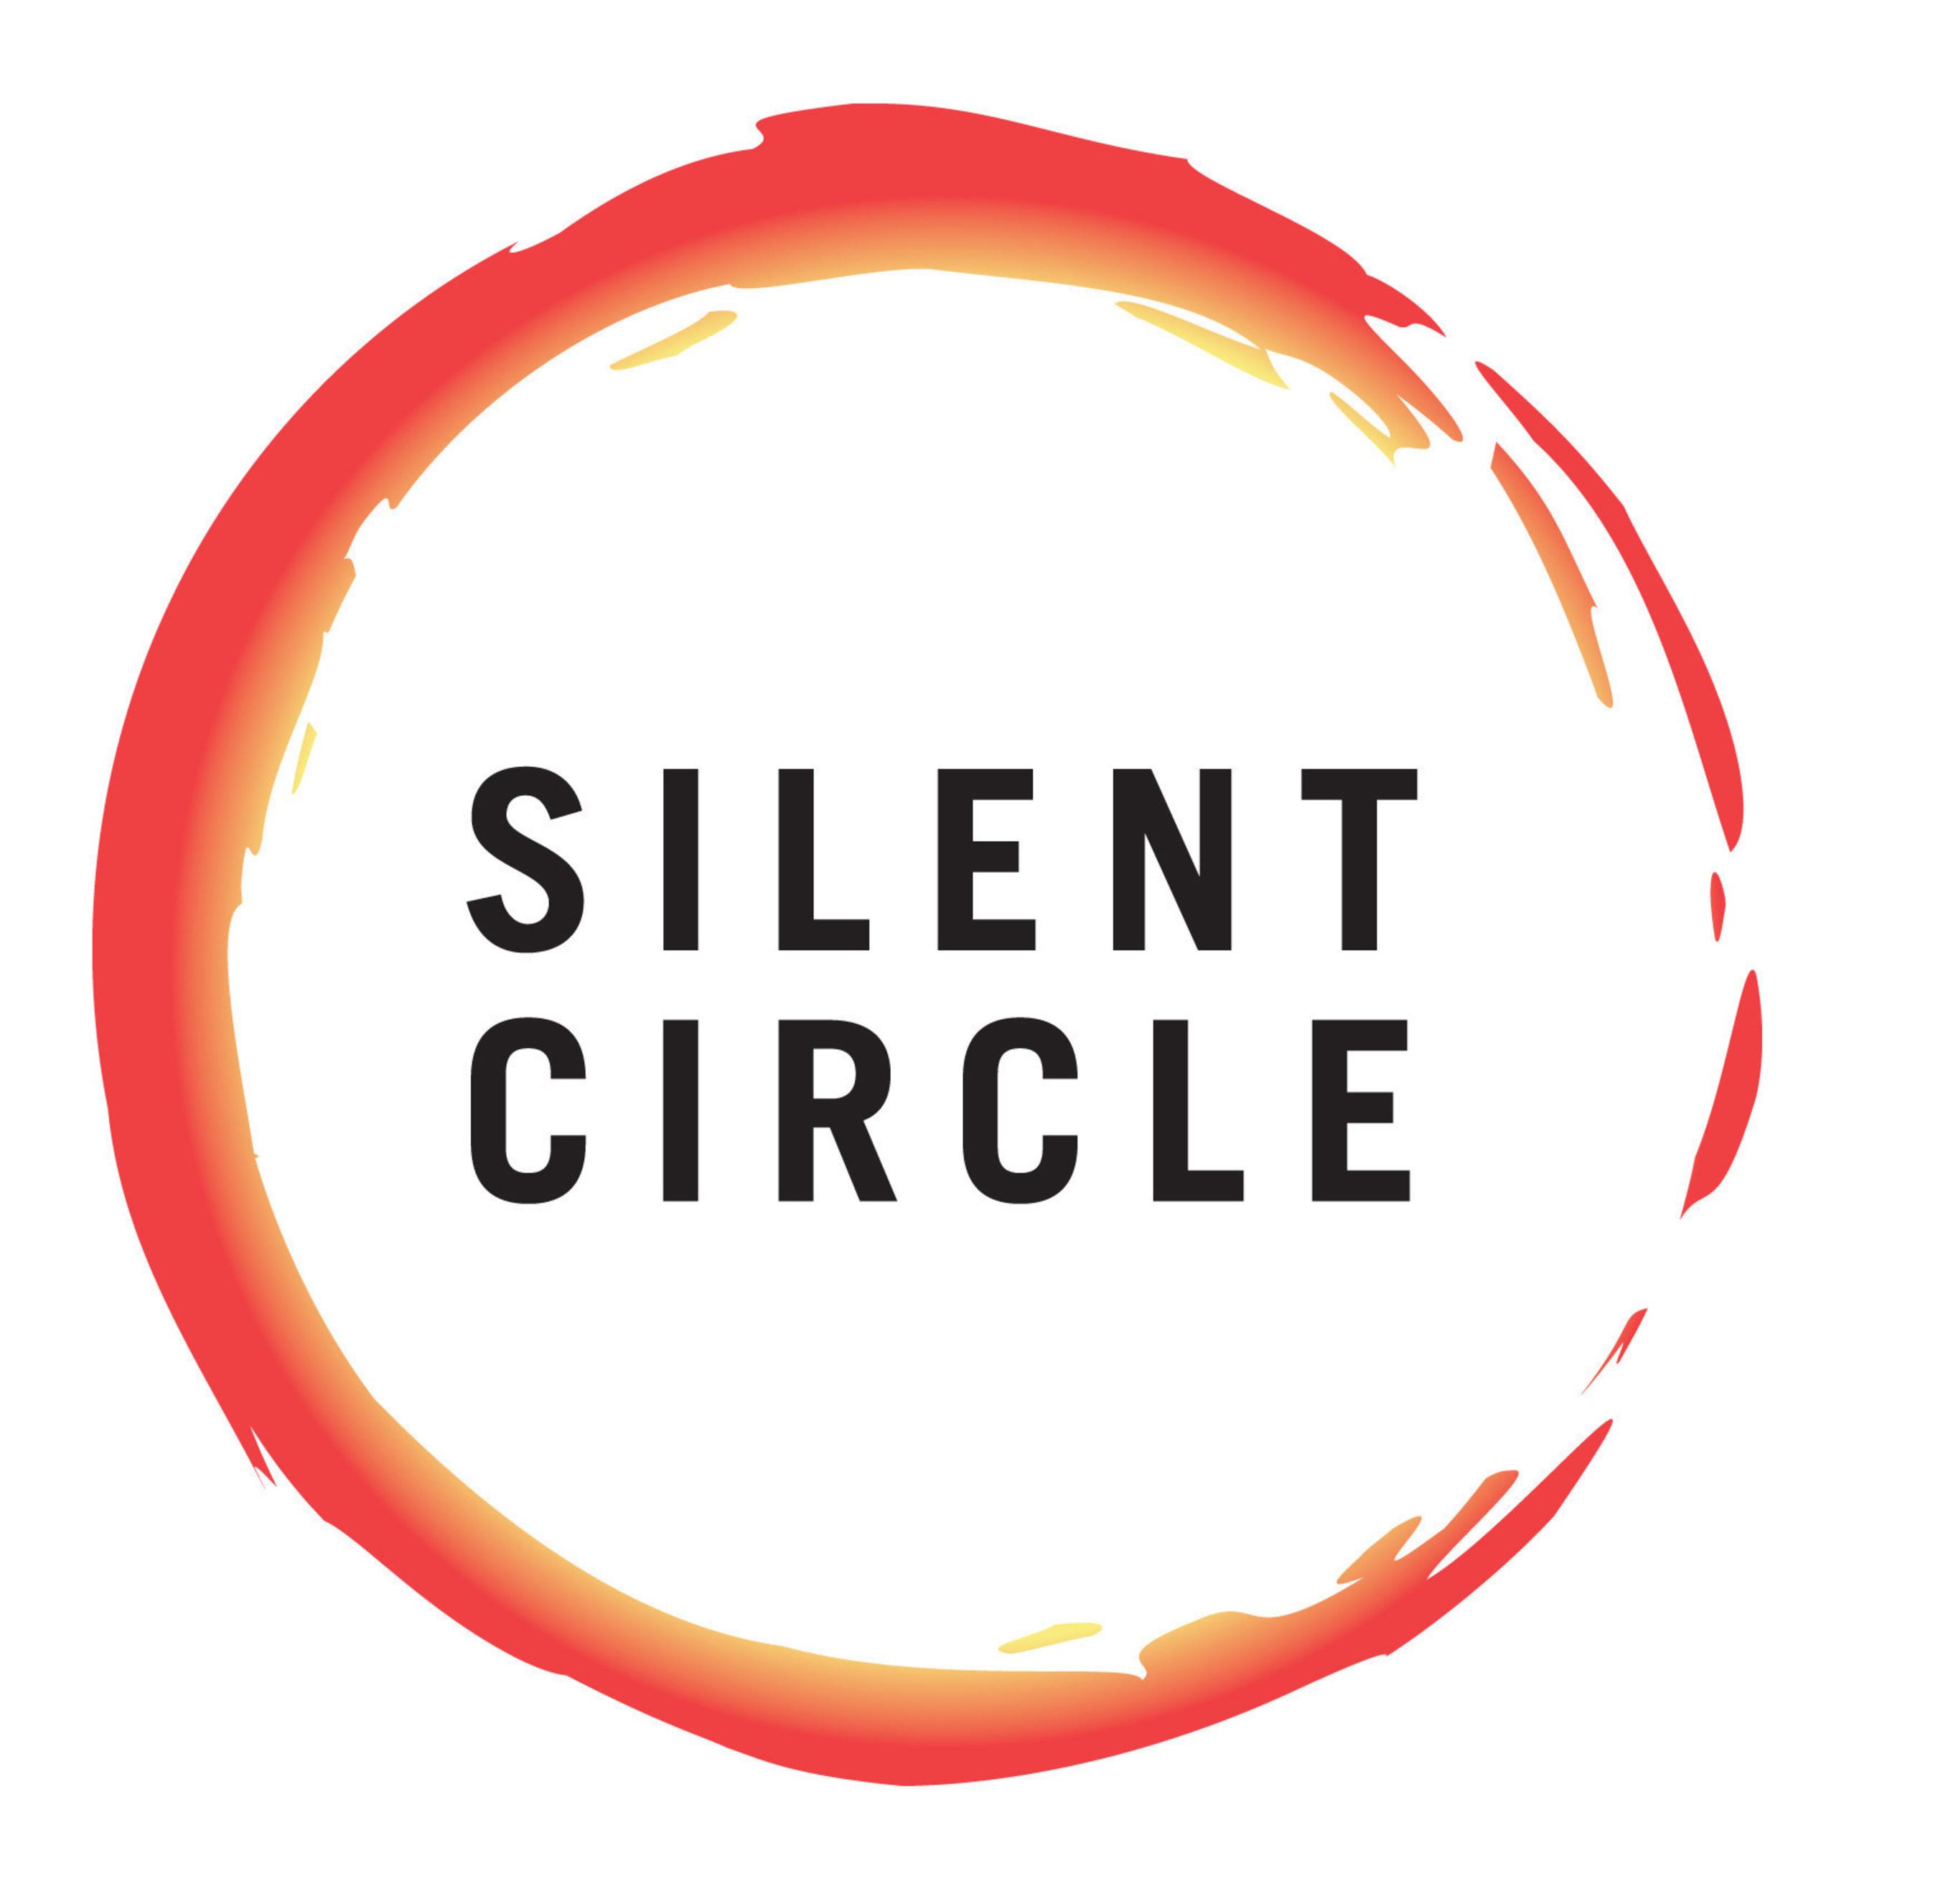 Silent Circle benoemt Bill Conner tot CEO